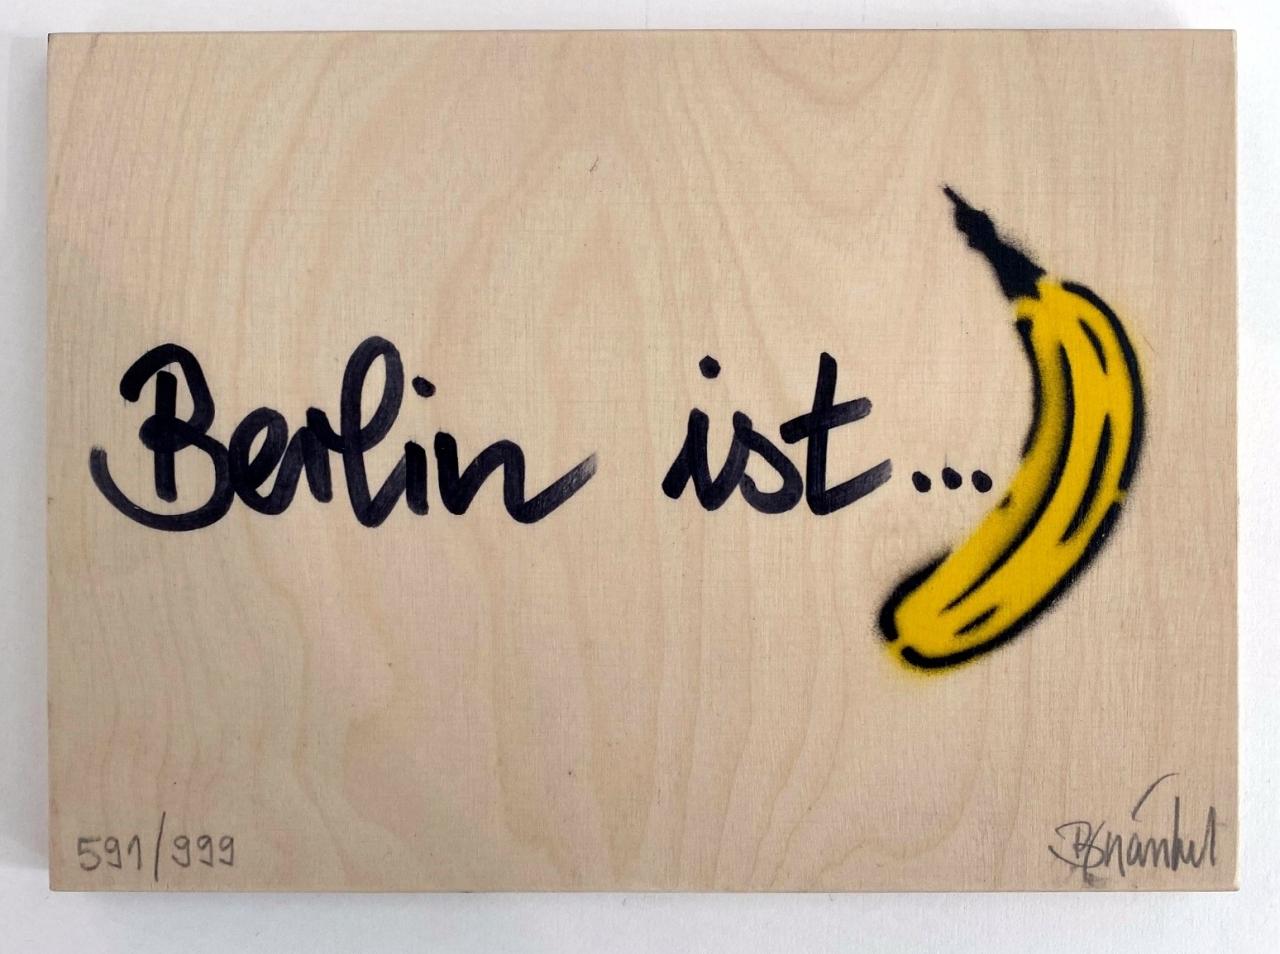 Berlin ist Banane